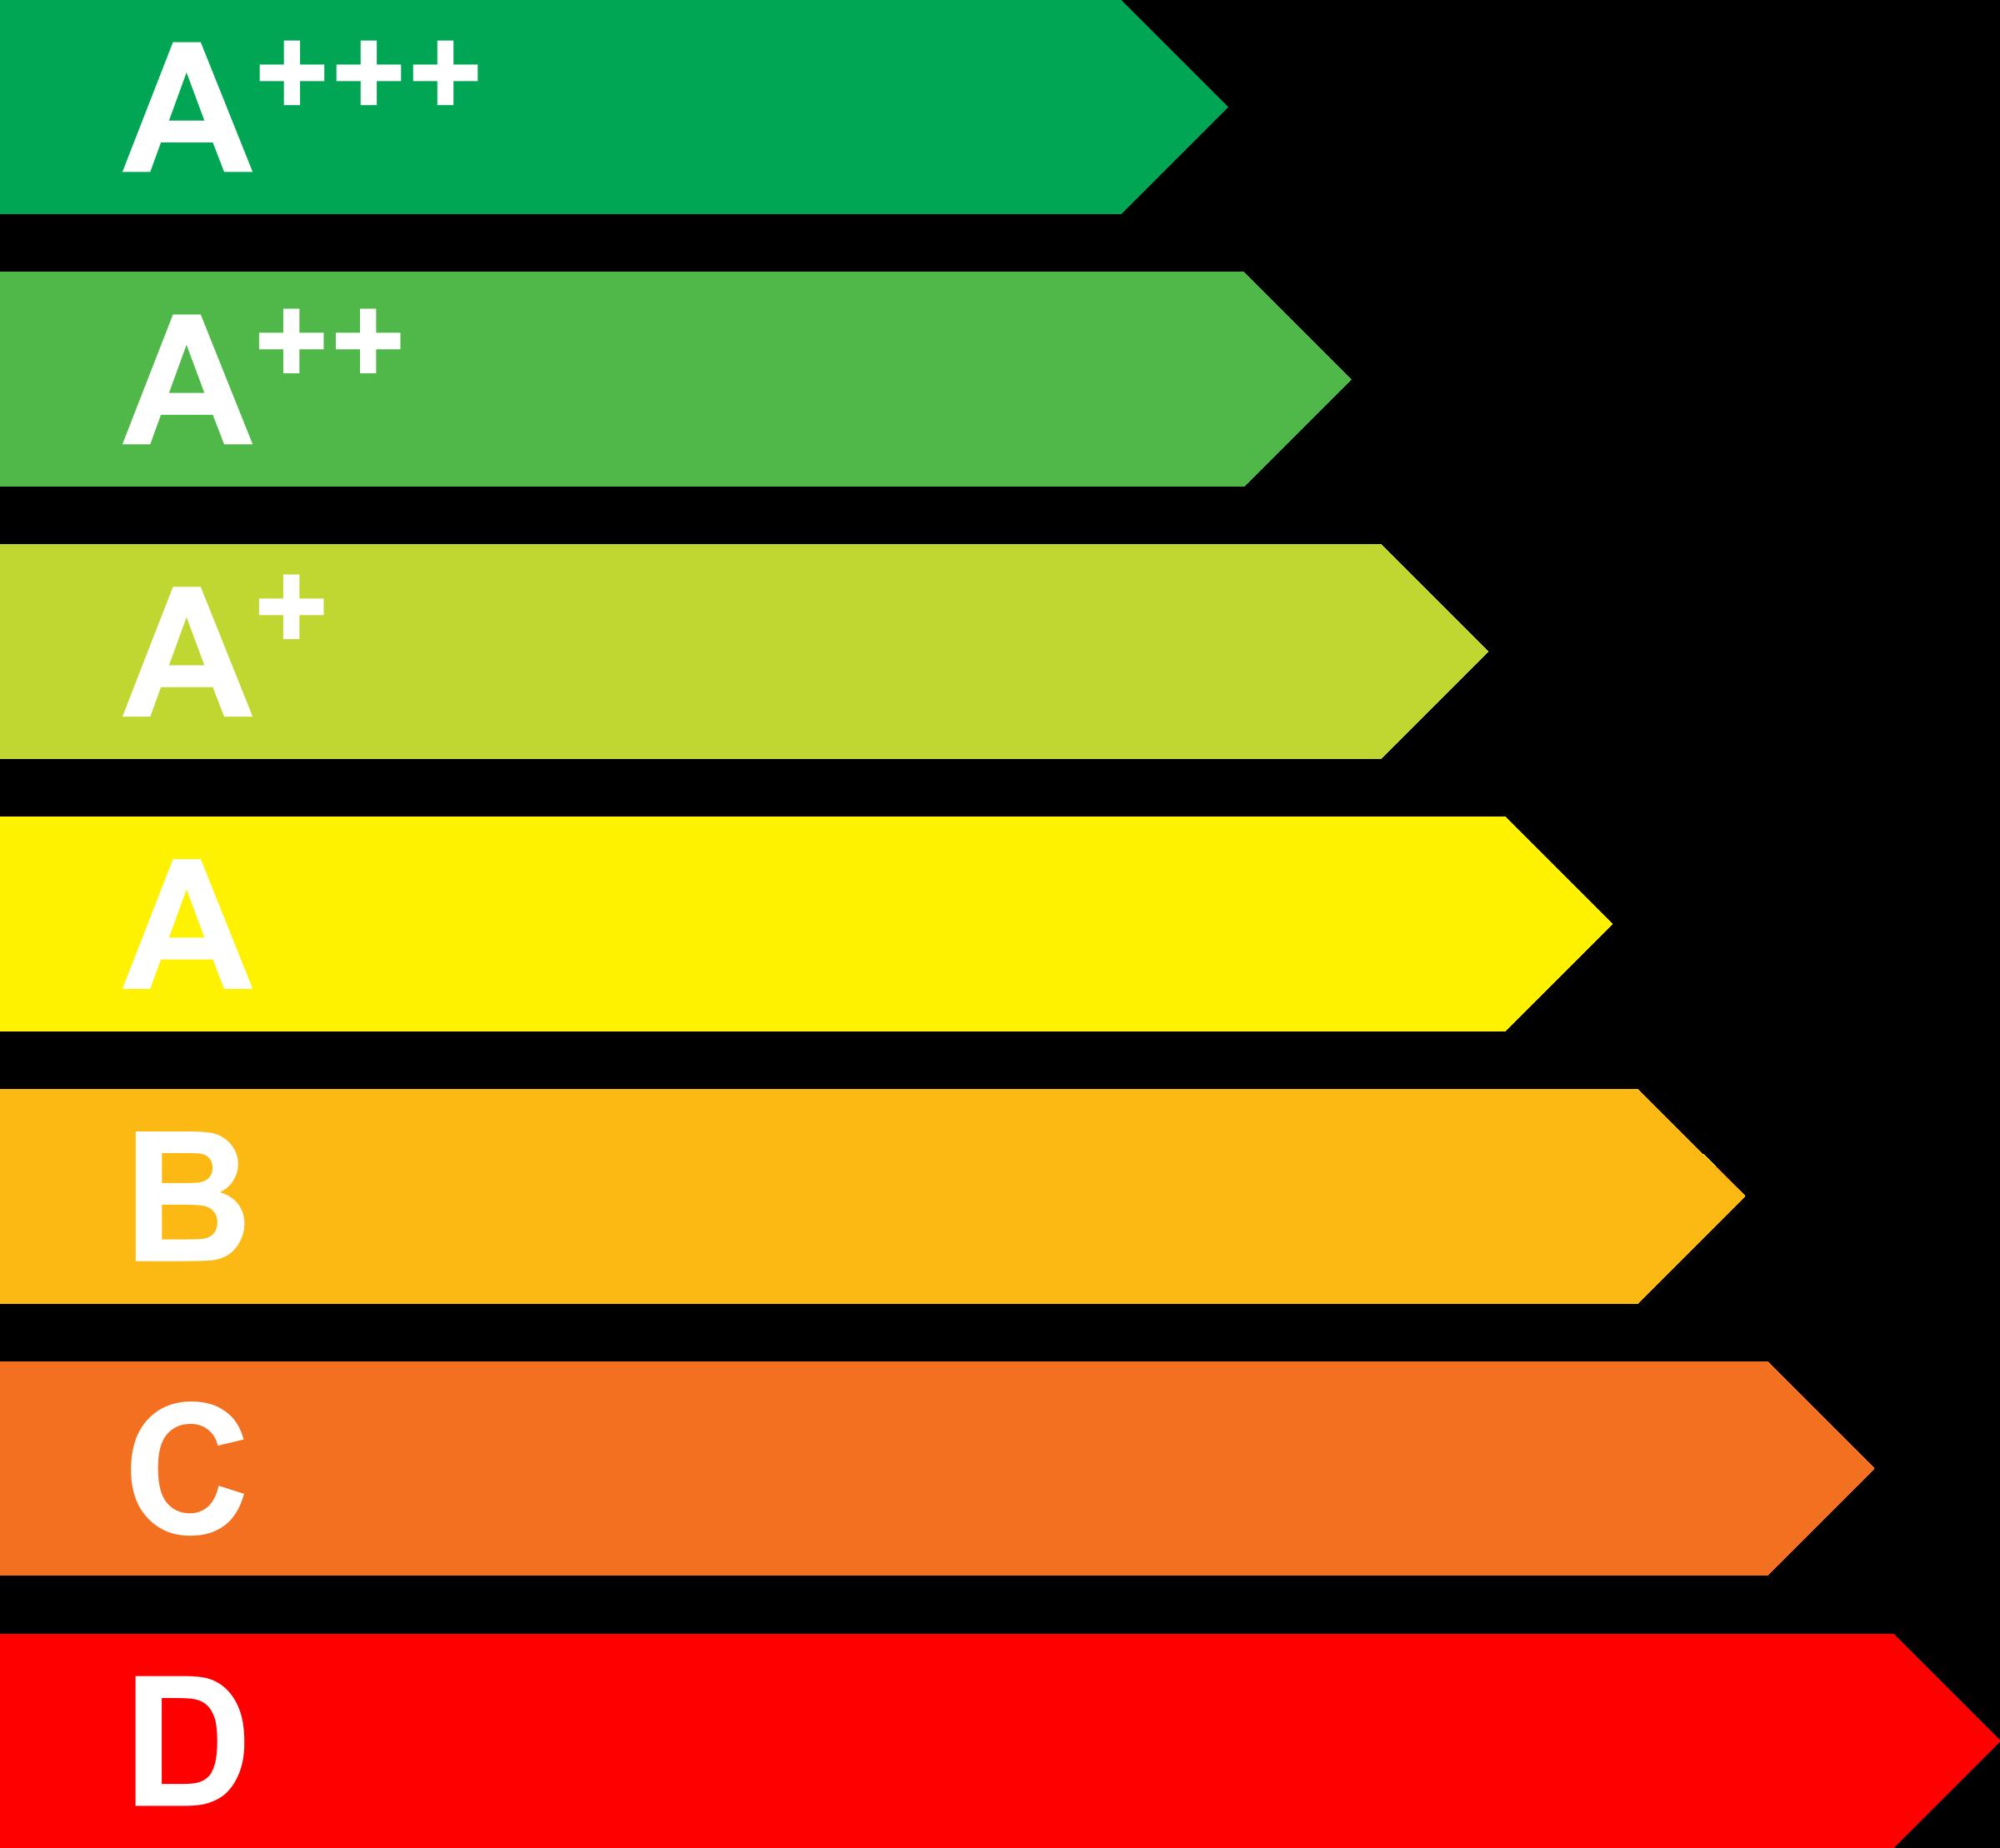 classe energetica condizionatori